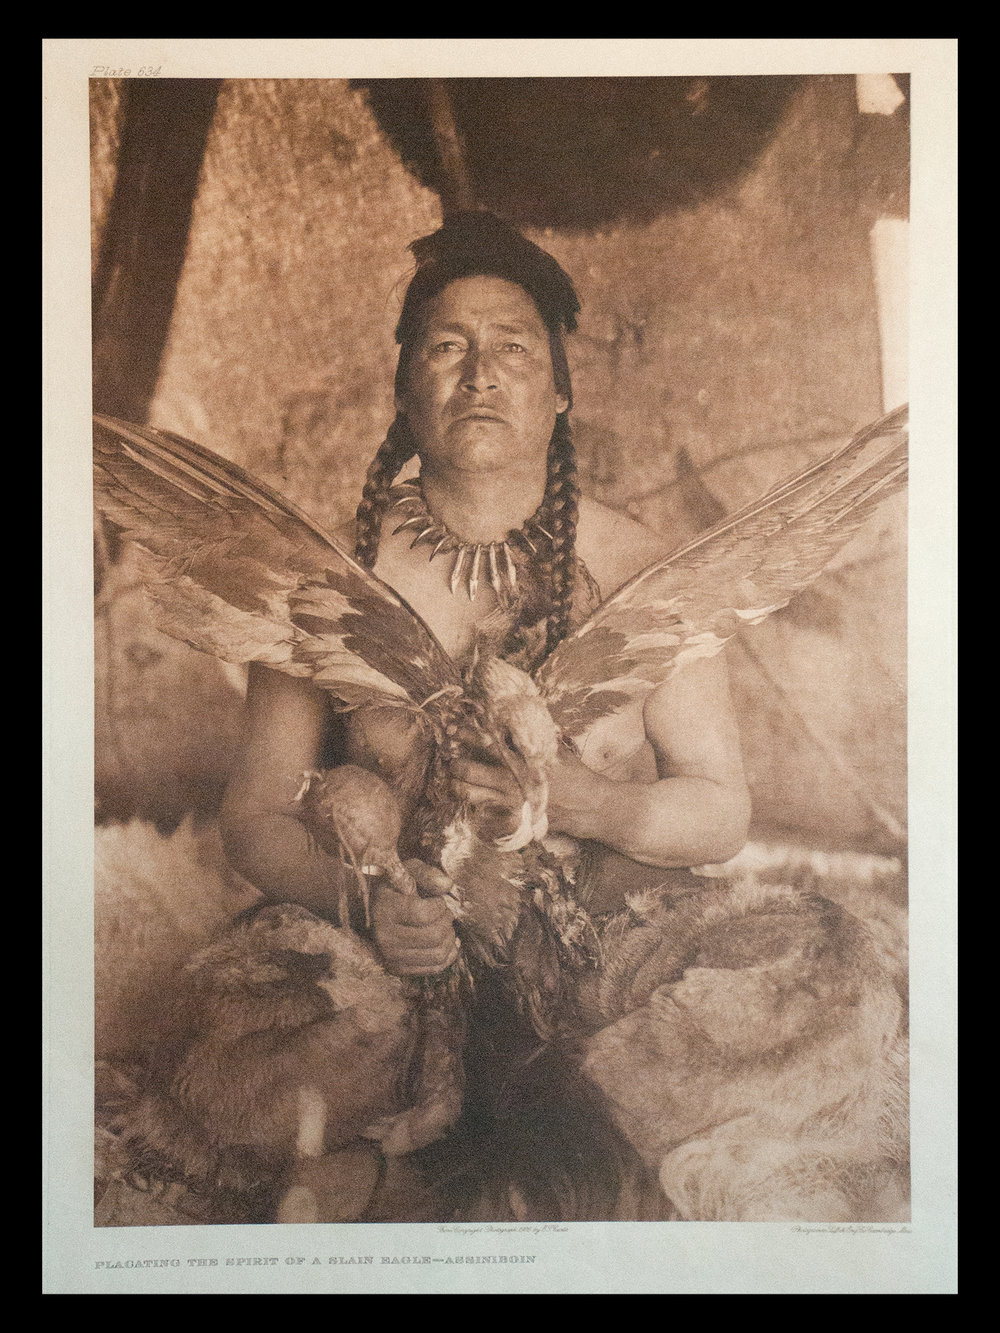 Plagating the Spirit of a Slain Eagle-Assiniboin final.jpg